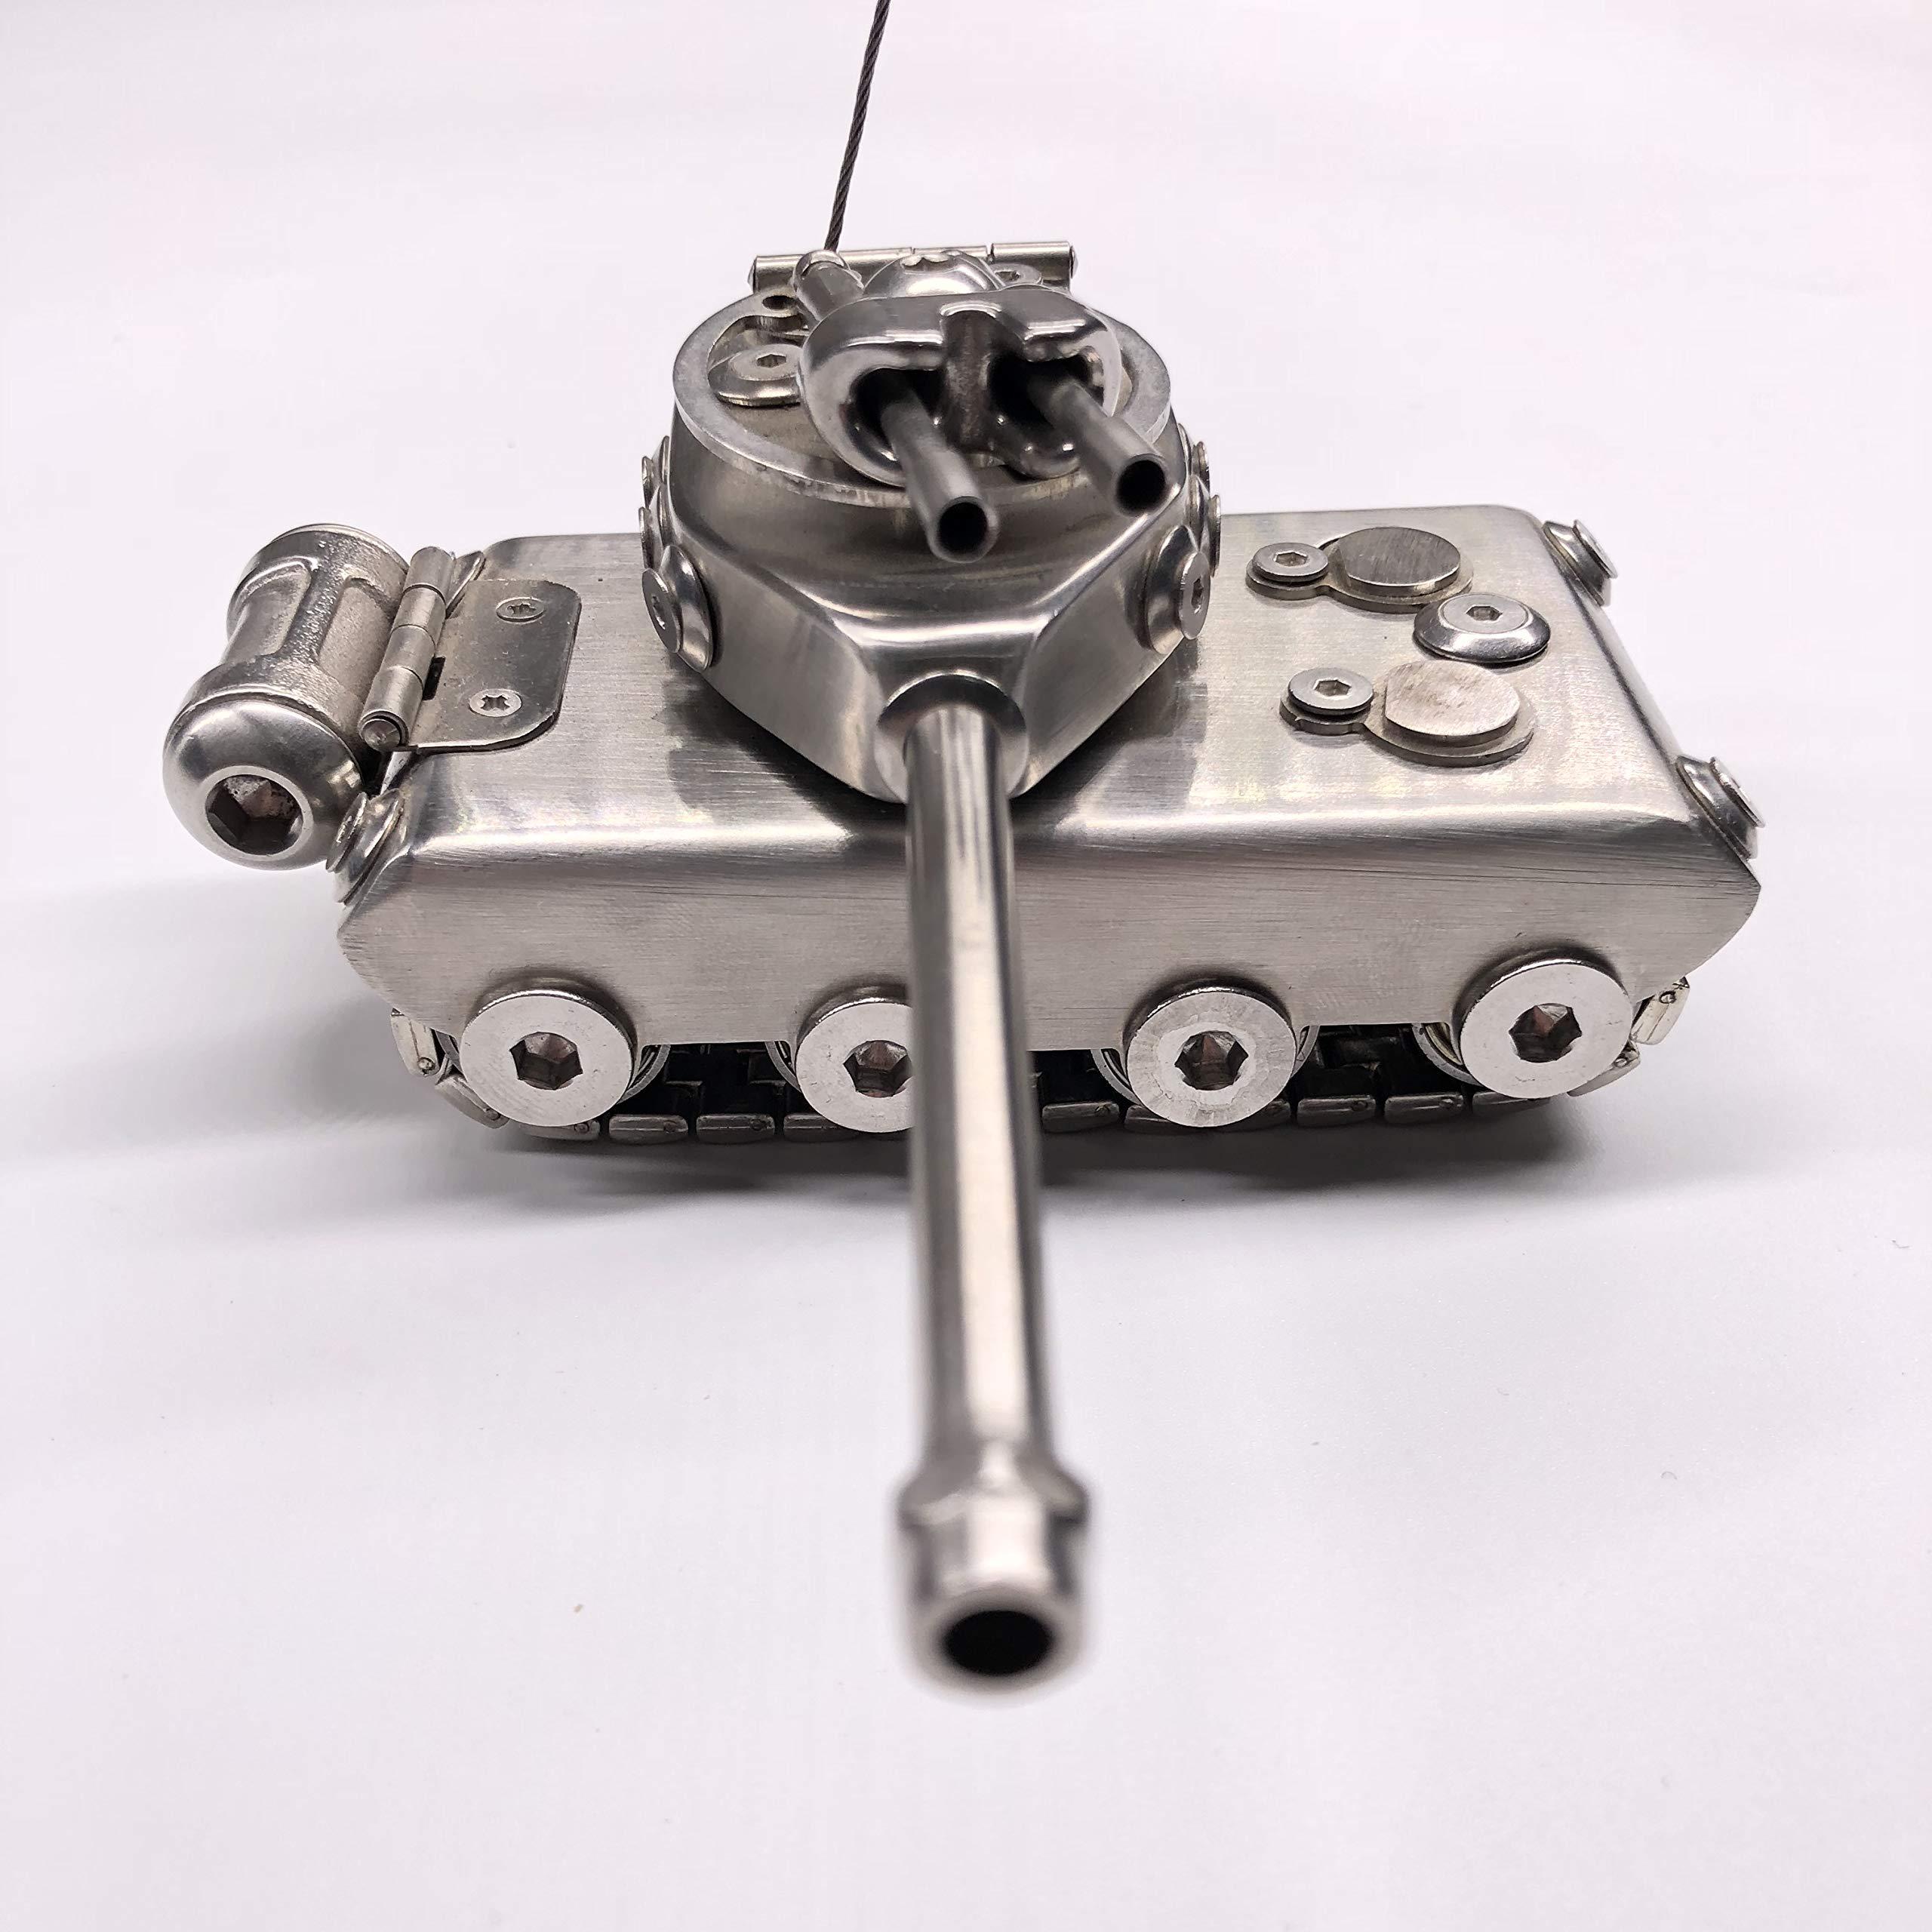 alasa Handmade Metal Tank Model Military Fans Must Collect by alasa (Image #5)